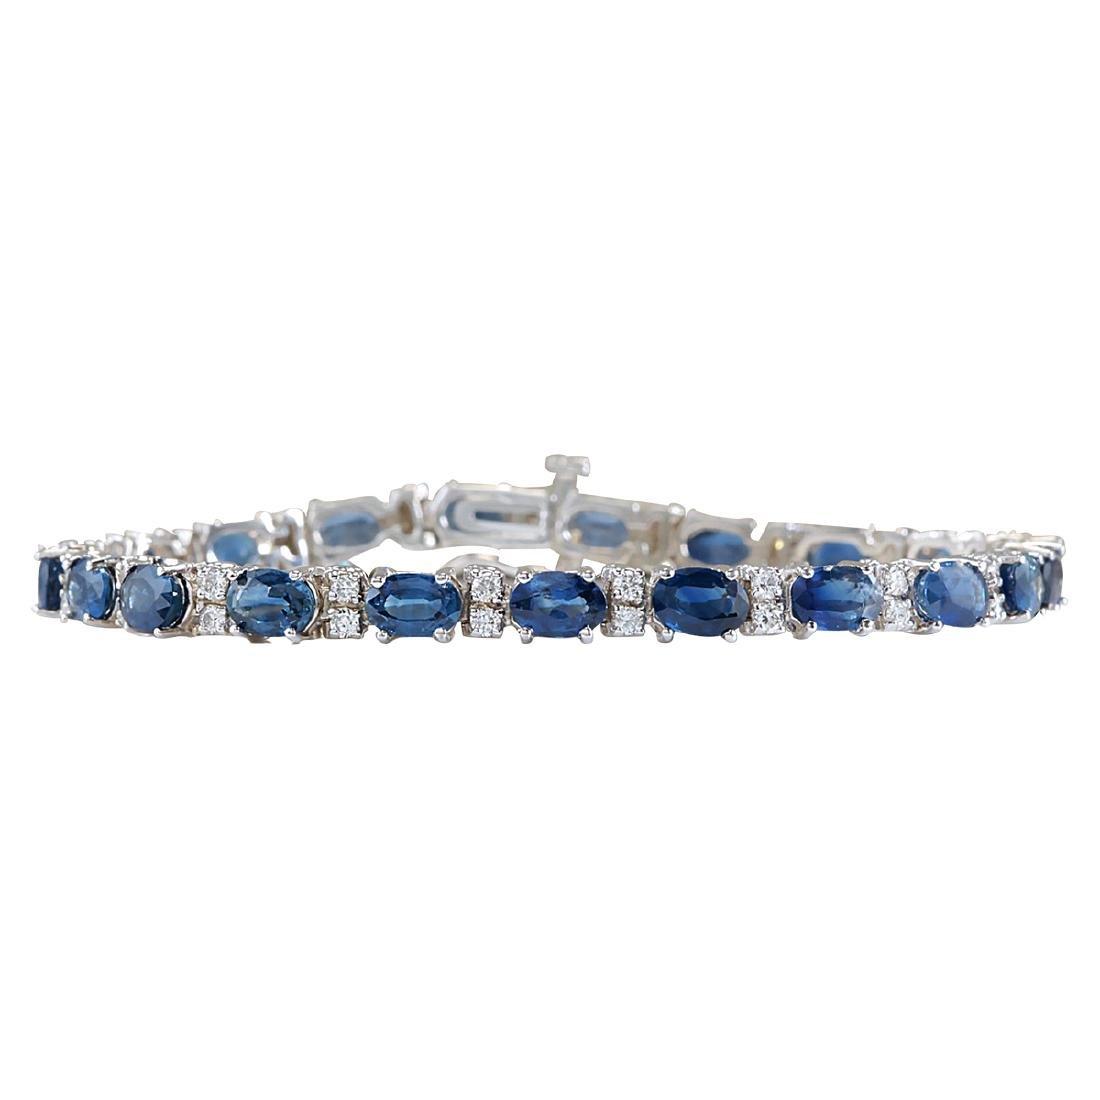 12.80CTW Natural Blue Sapphire Diamond Bracelet 14K